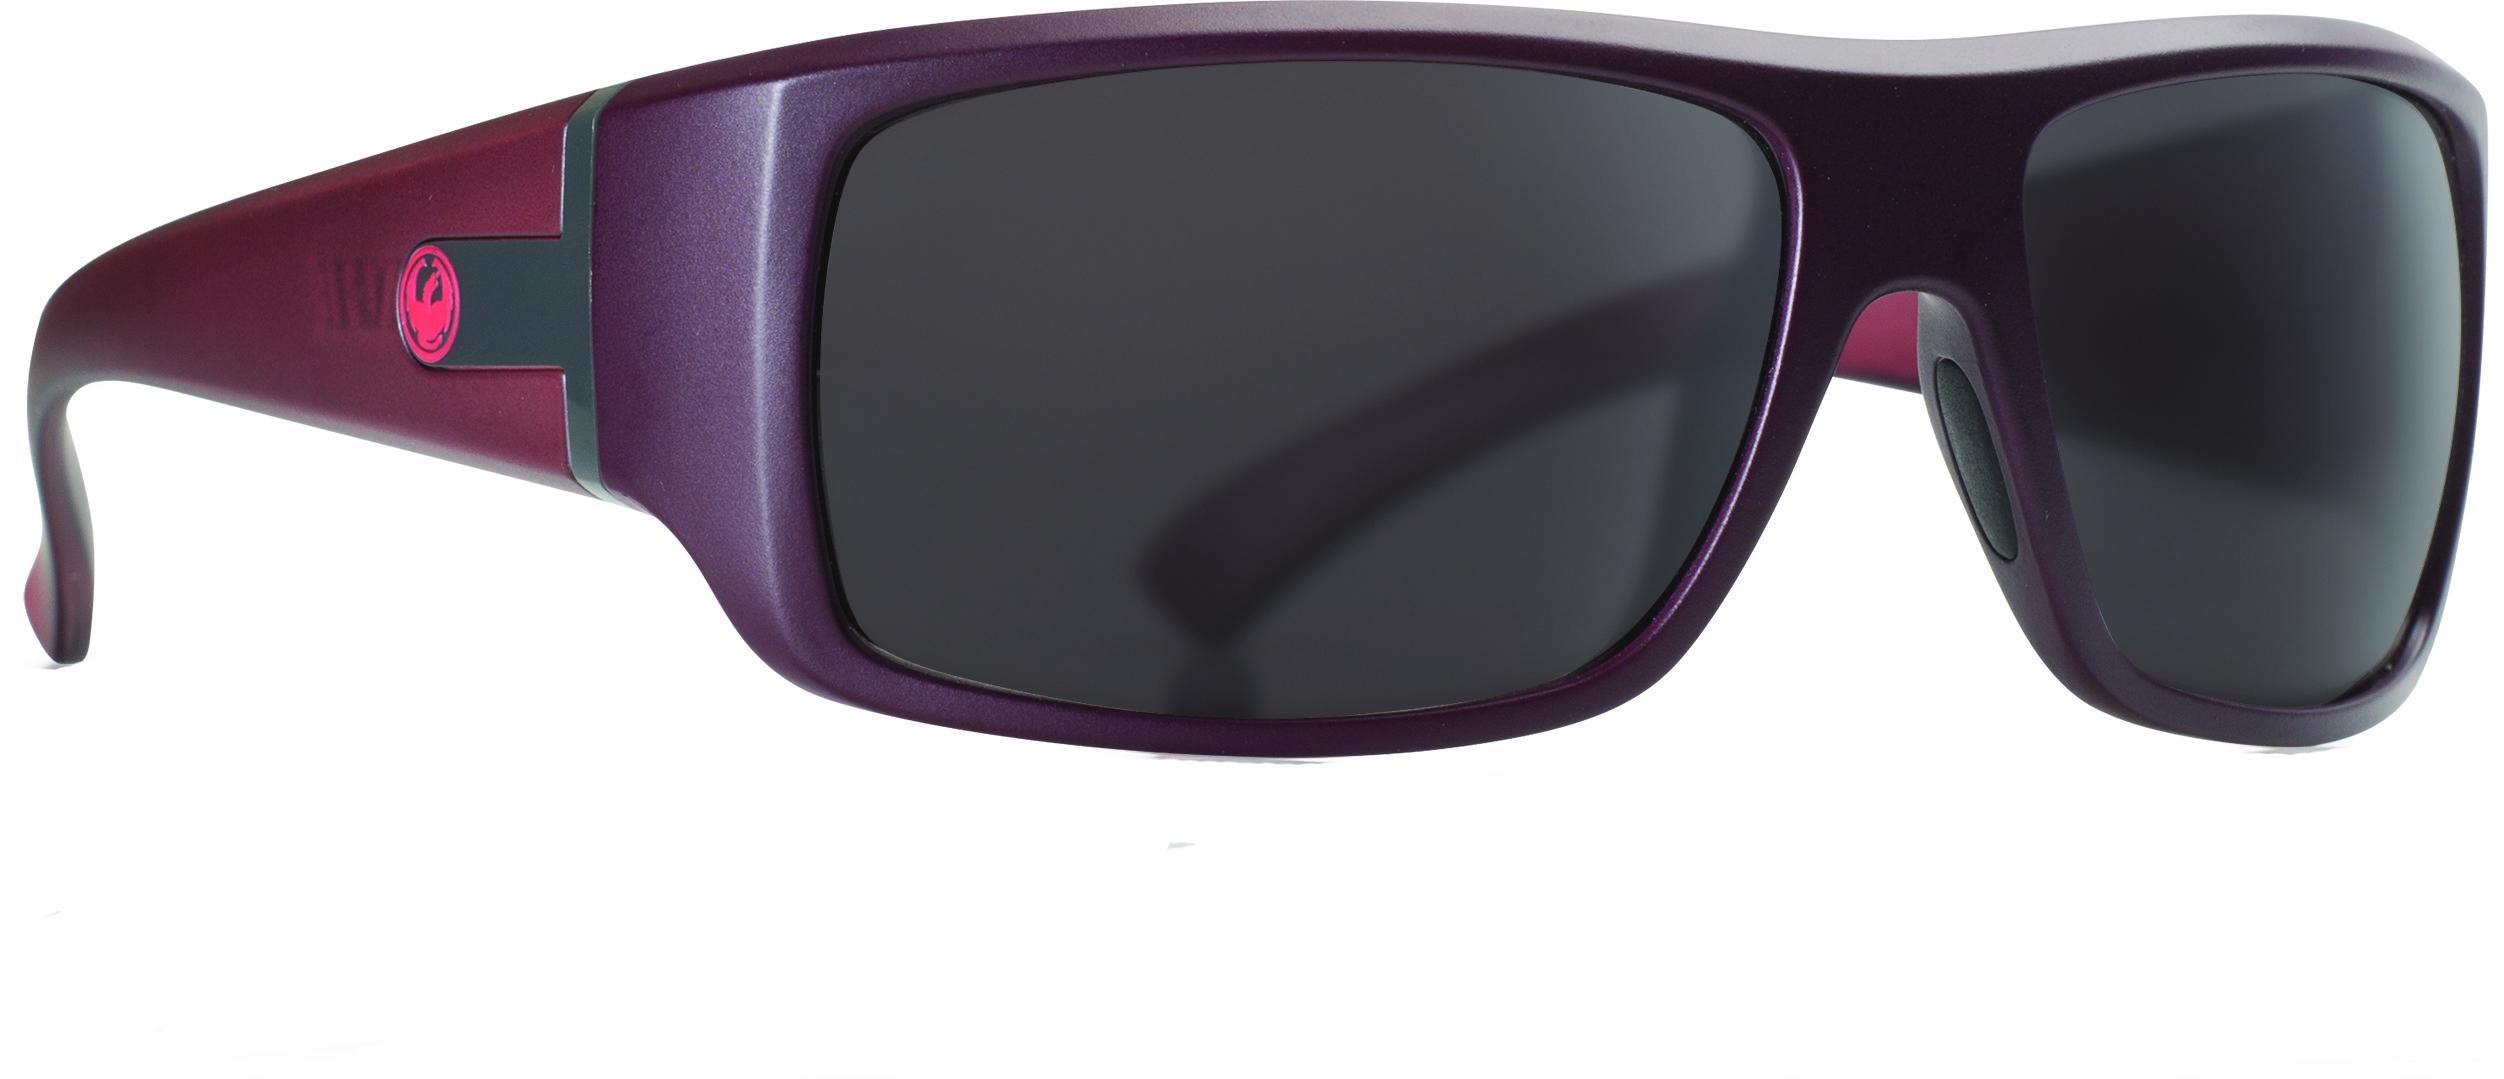 Vantage Sunglasses Matte Rosewood W/Smoke Polar Lens